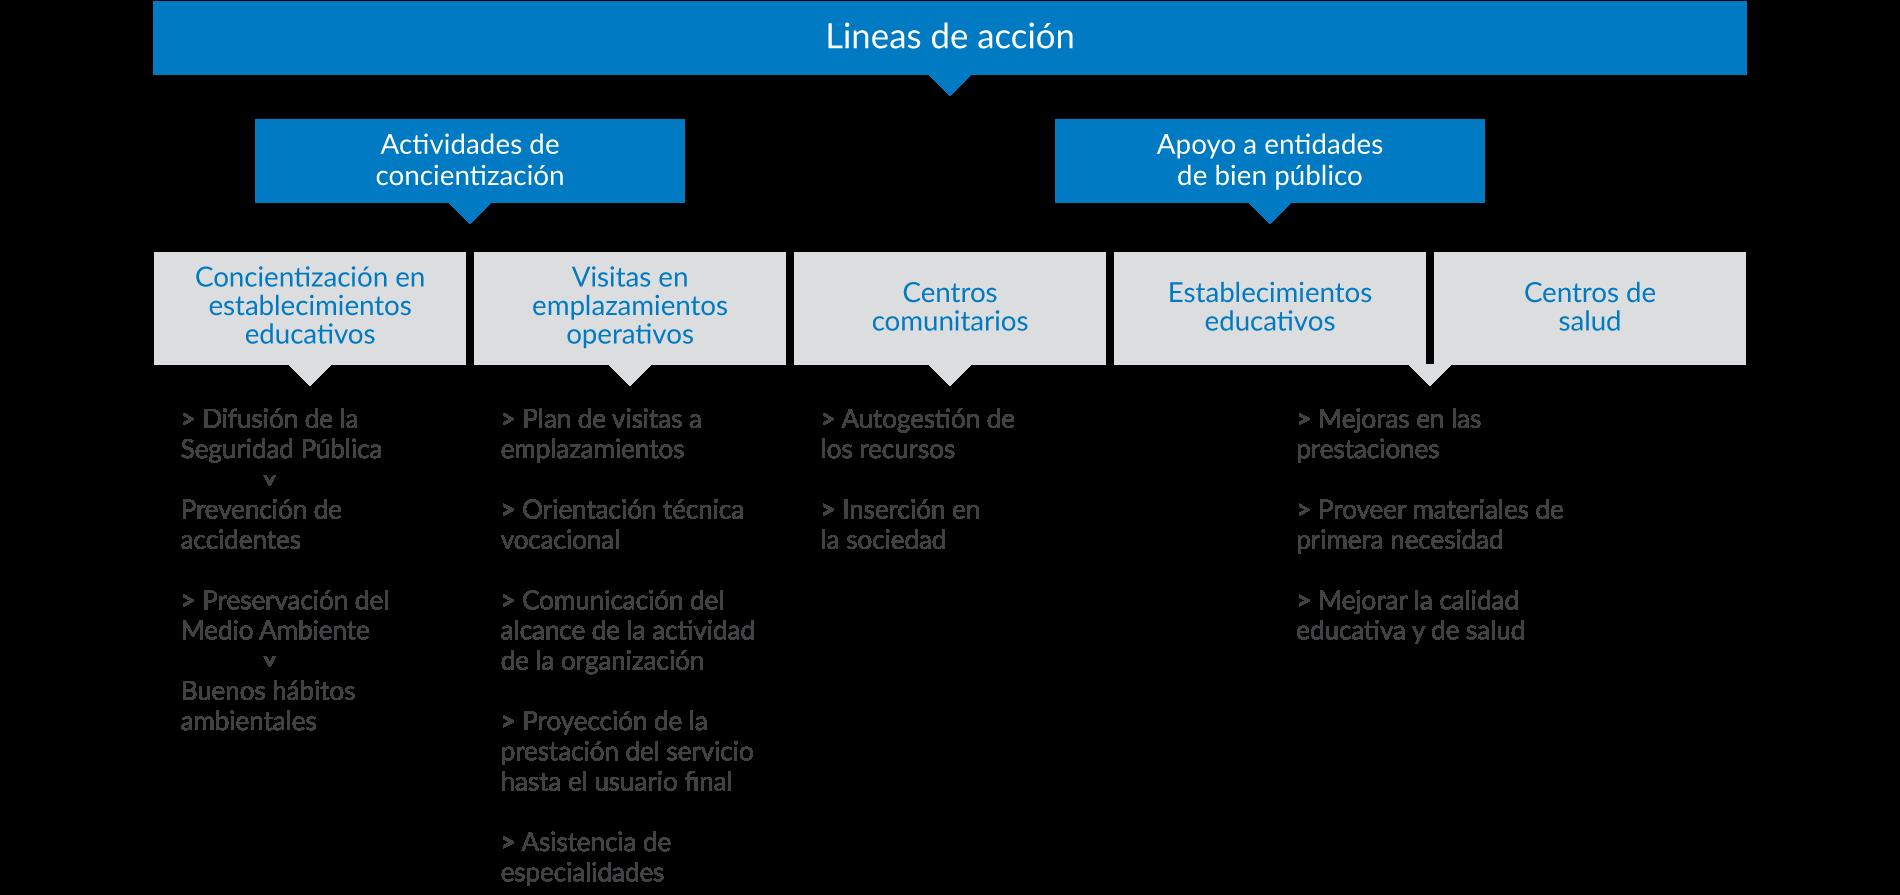 cuadro-lineas-accion-2